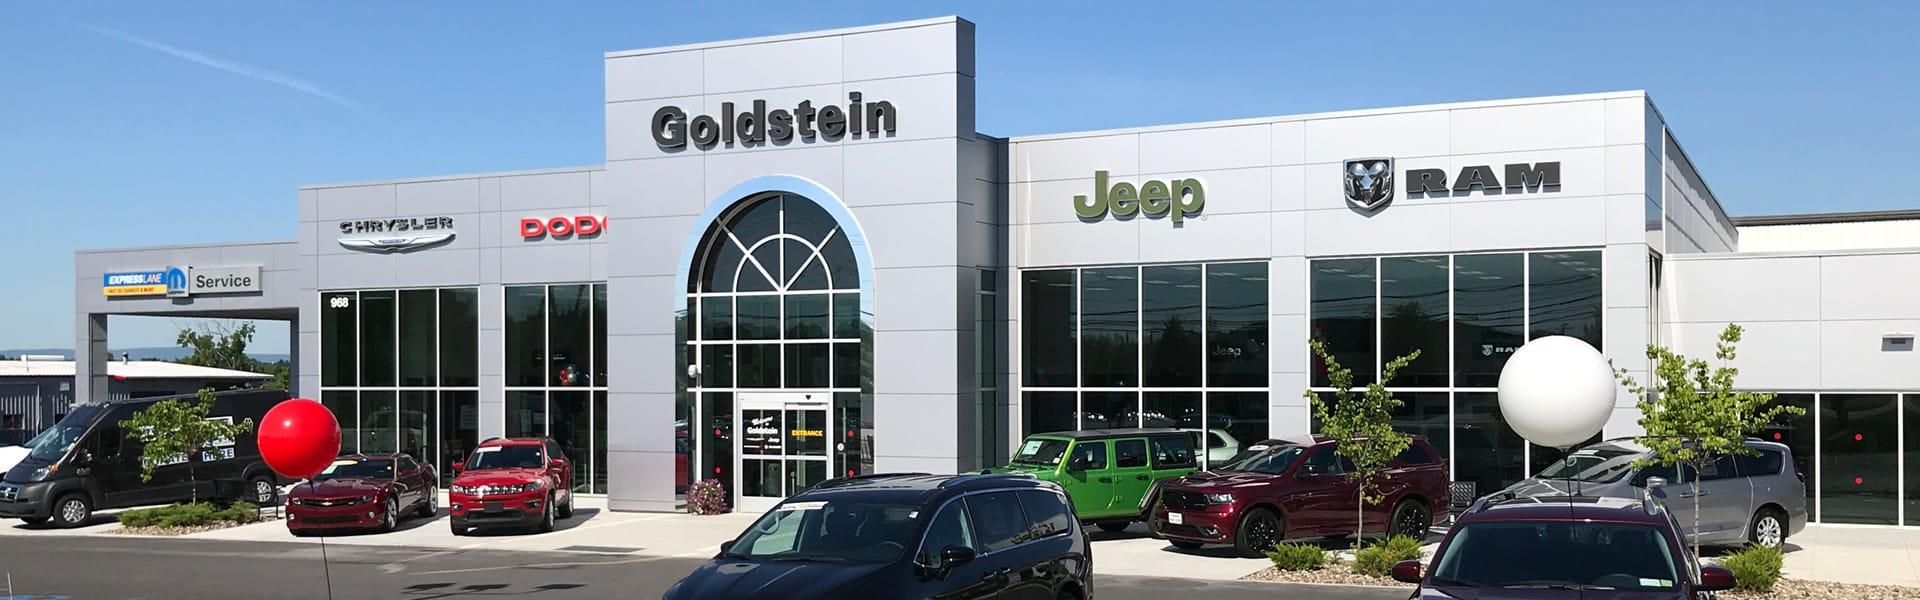 car dealership latham ny goldstein chrysler jeep dodge ram goldstein chrysler jeep dodge ram